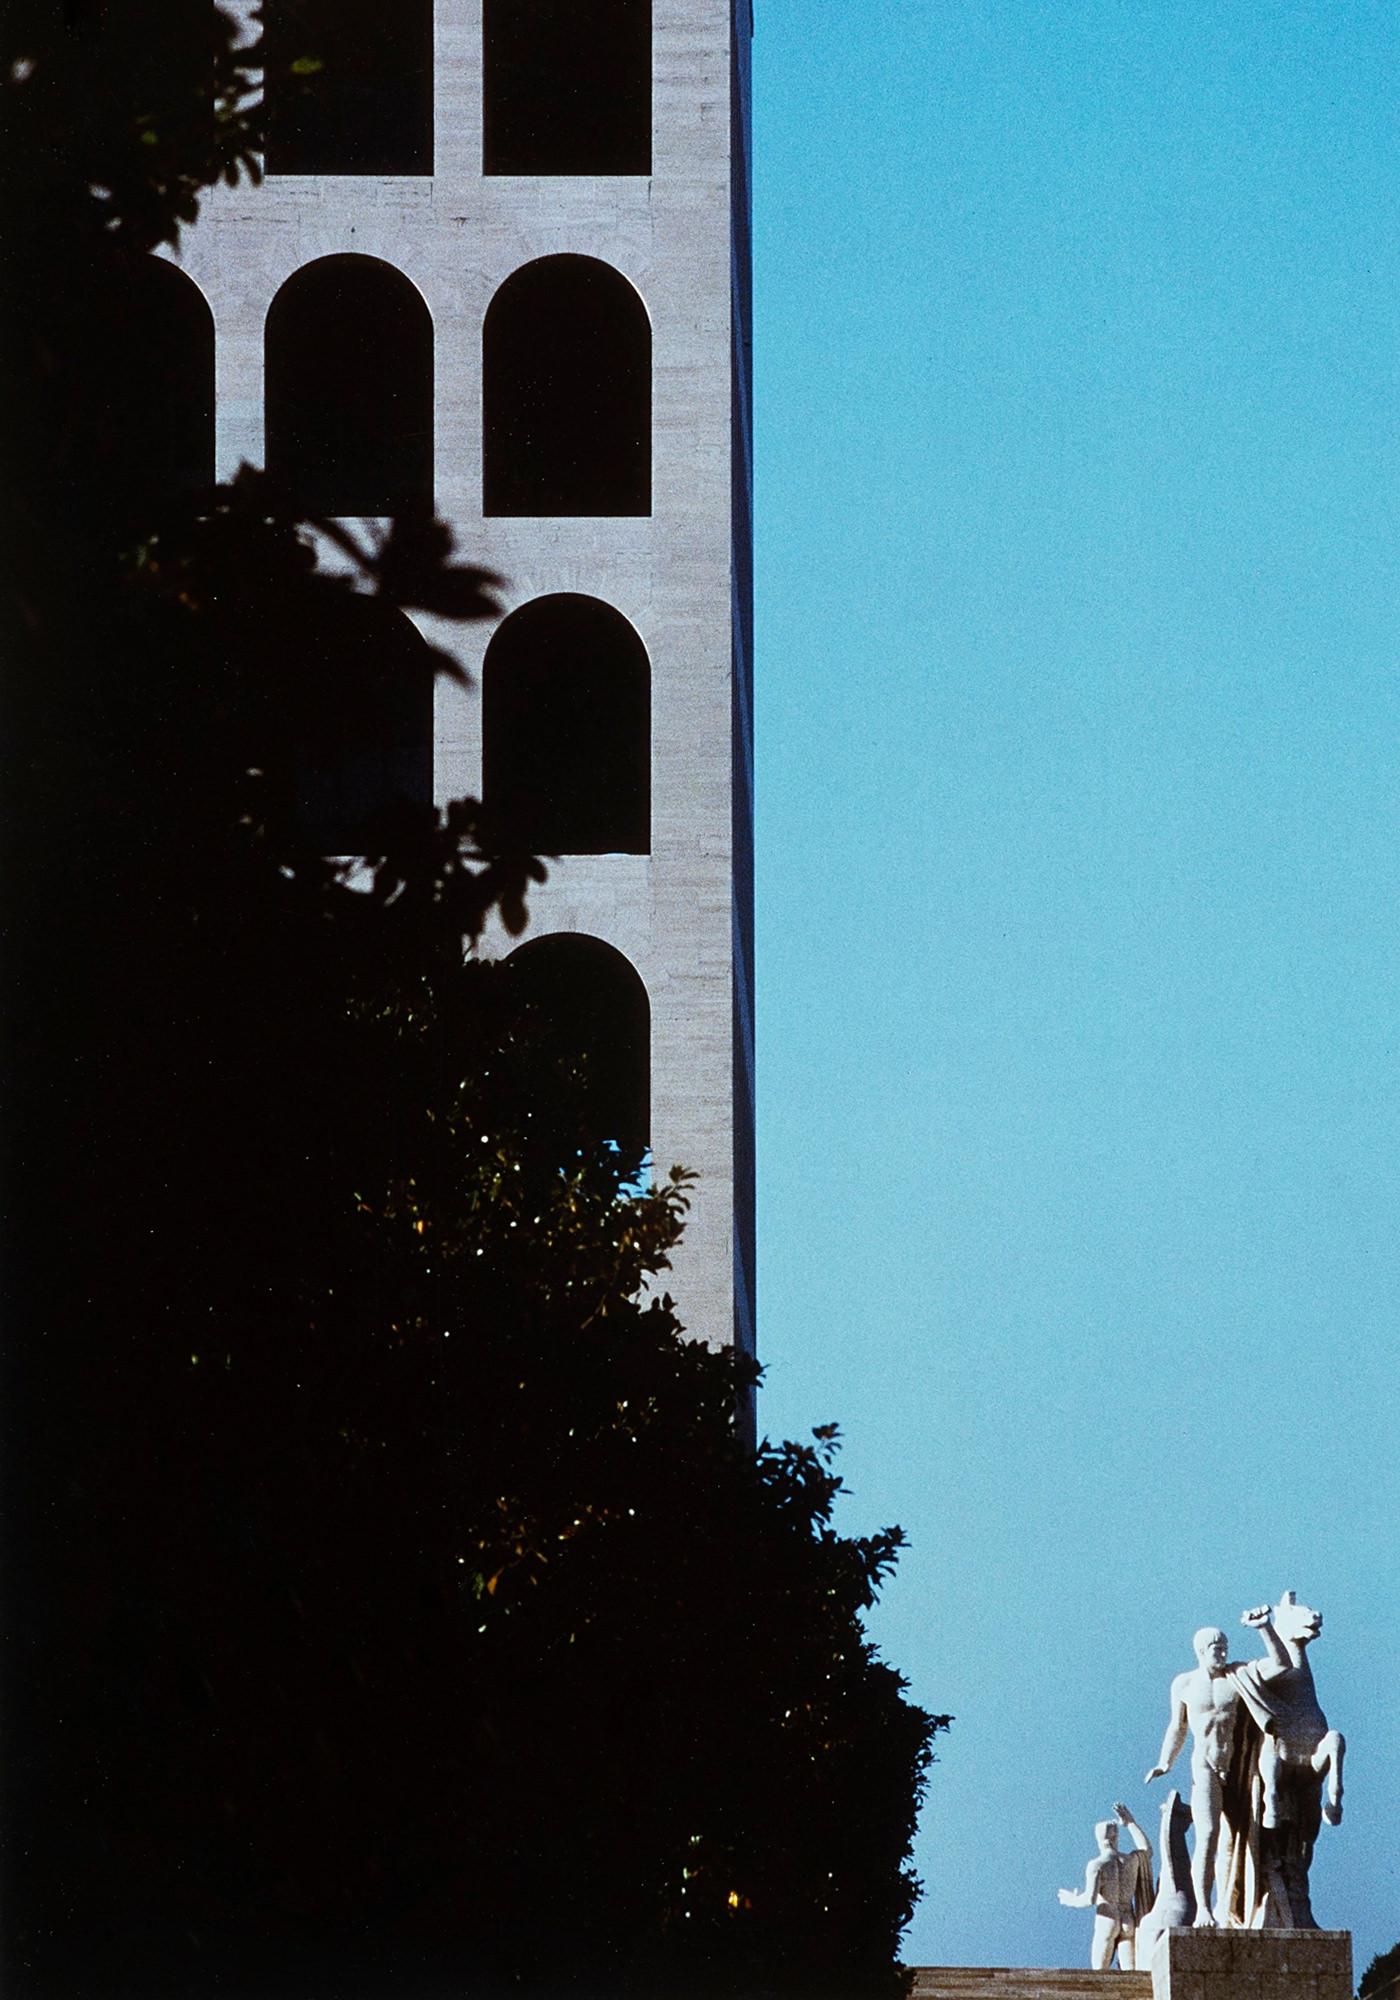 Franco Fontana Photographie Roma 1980